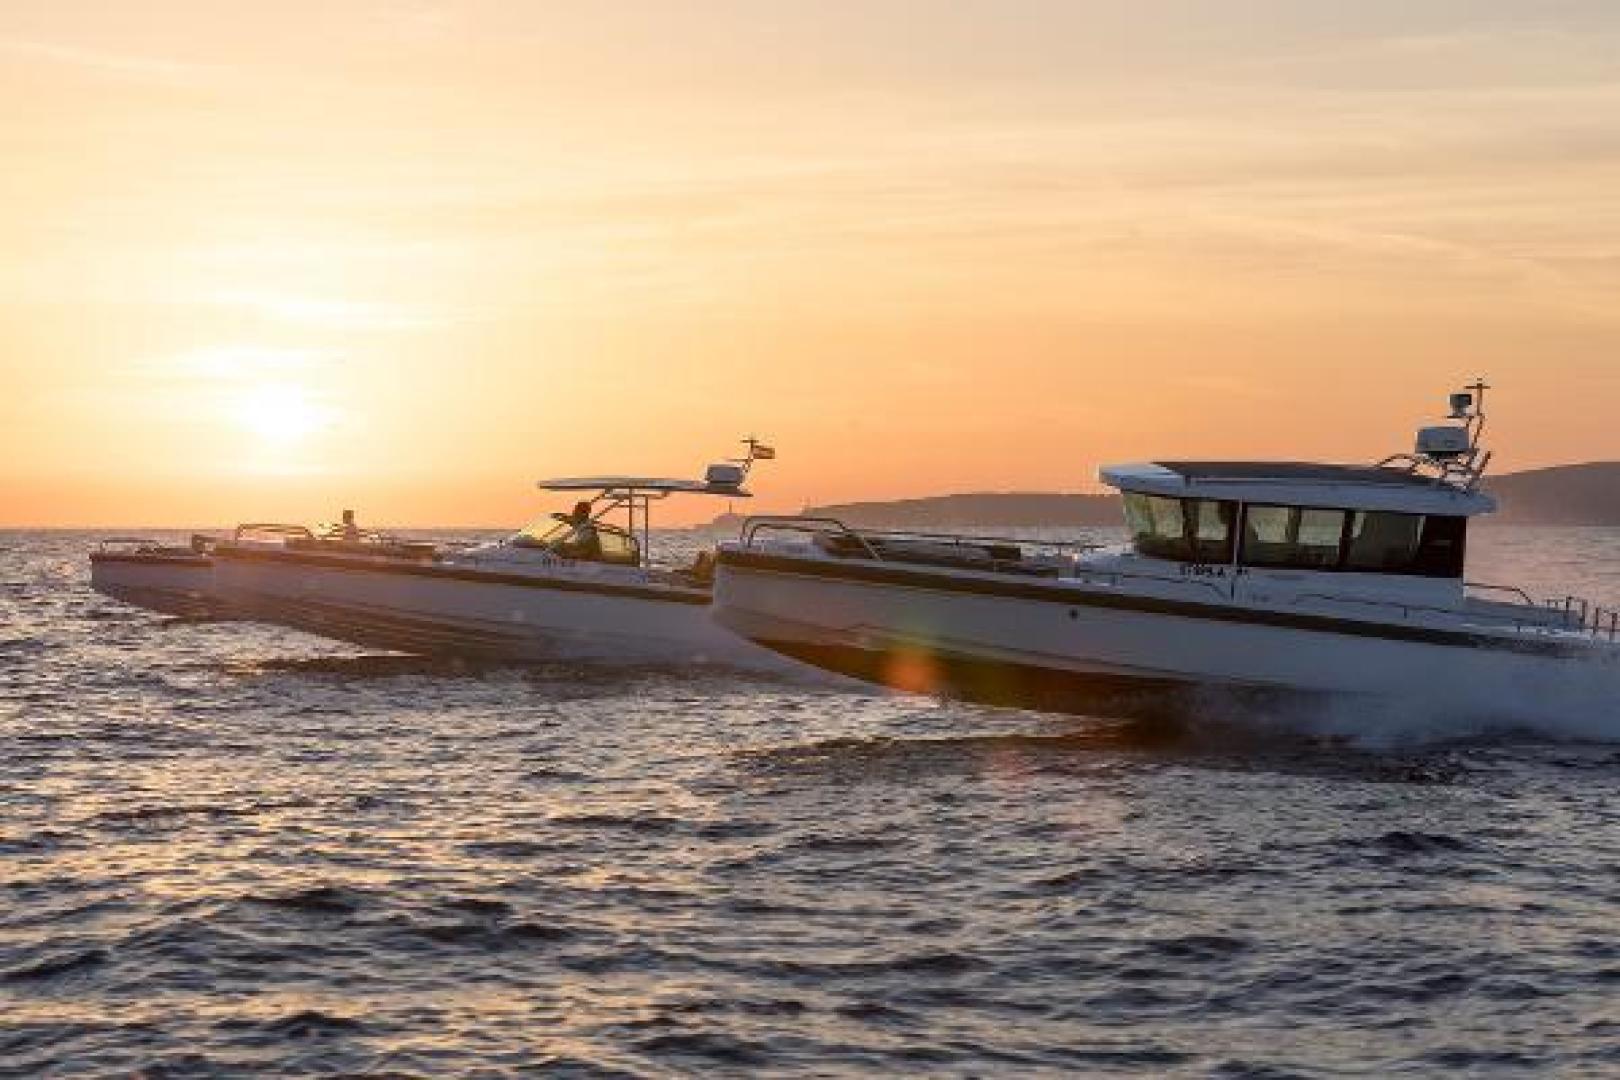 Axopar-28 CABIN 2020-Axopar 28 CABIN Fort Lauderdale-Florida-United States-1531306 | Thumbnail